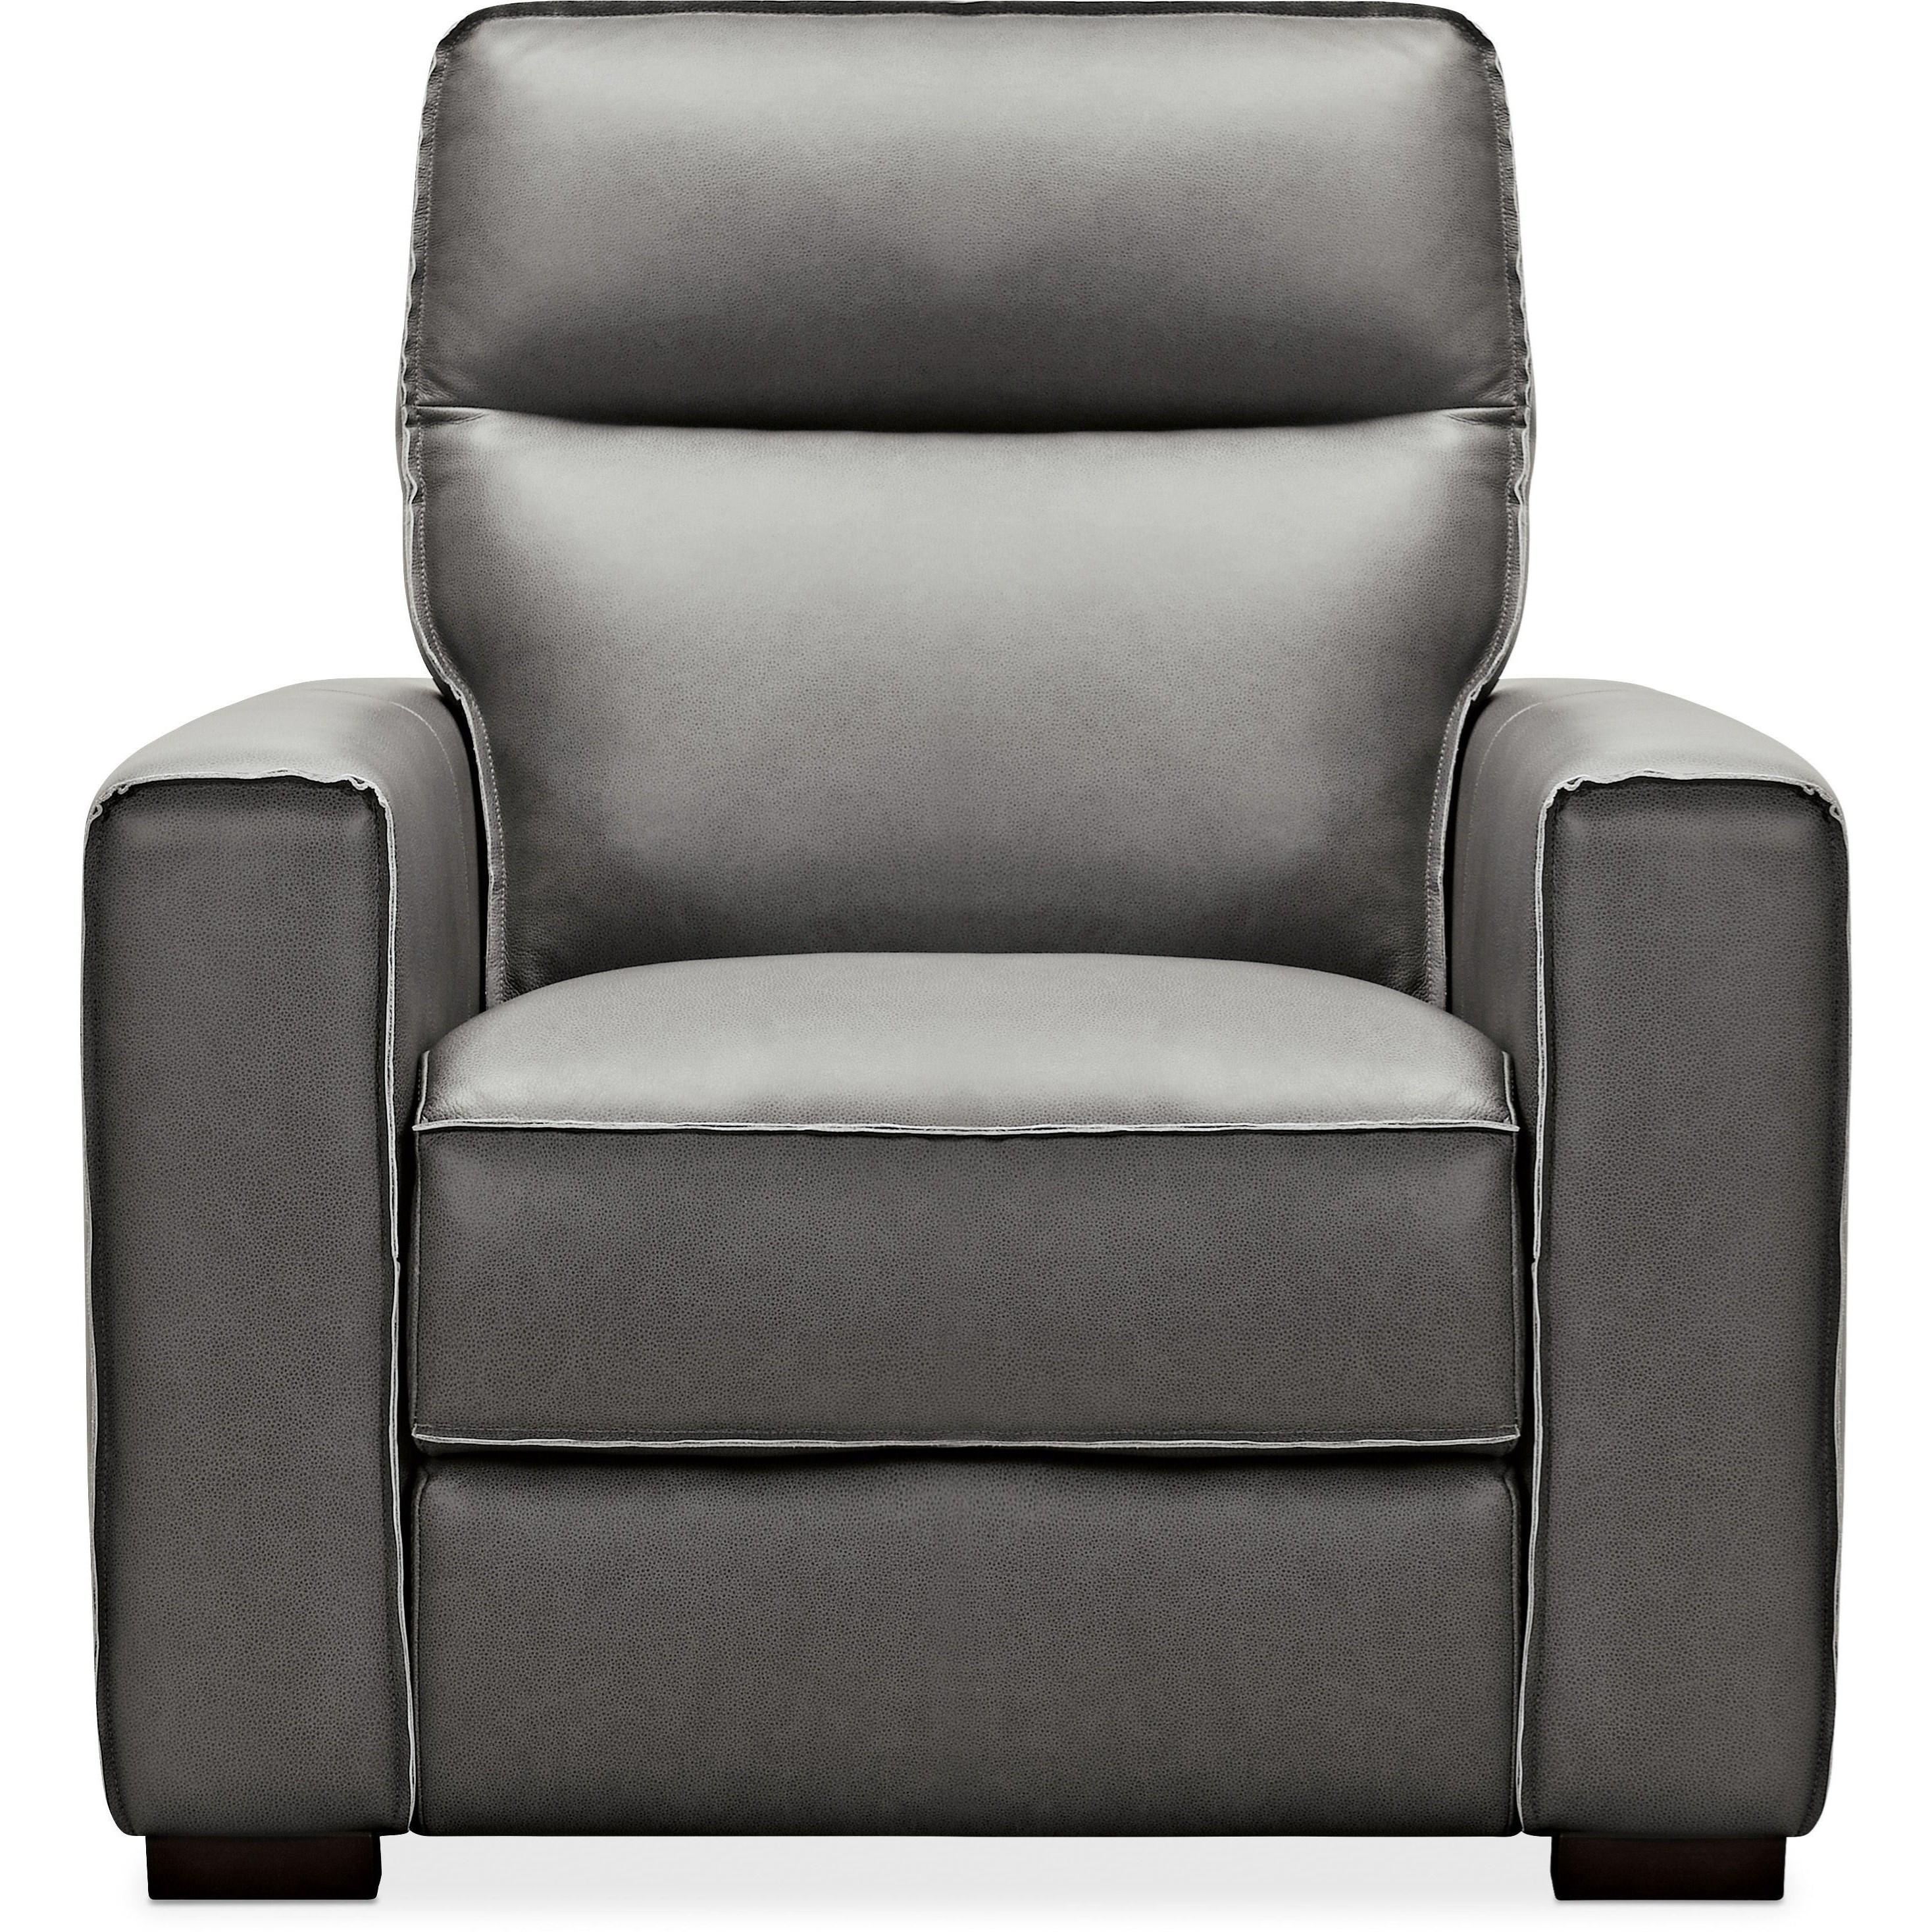 Braeburn Leather Recliner w/ Power Headrest by Hooker Furniture at Zak's Home